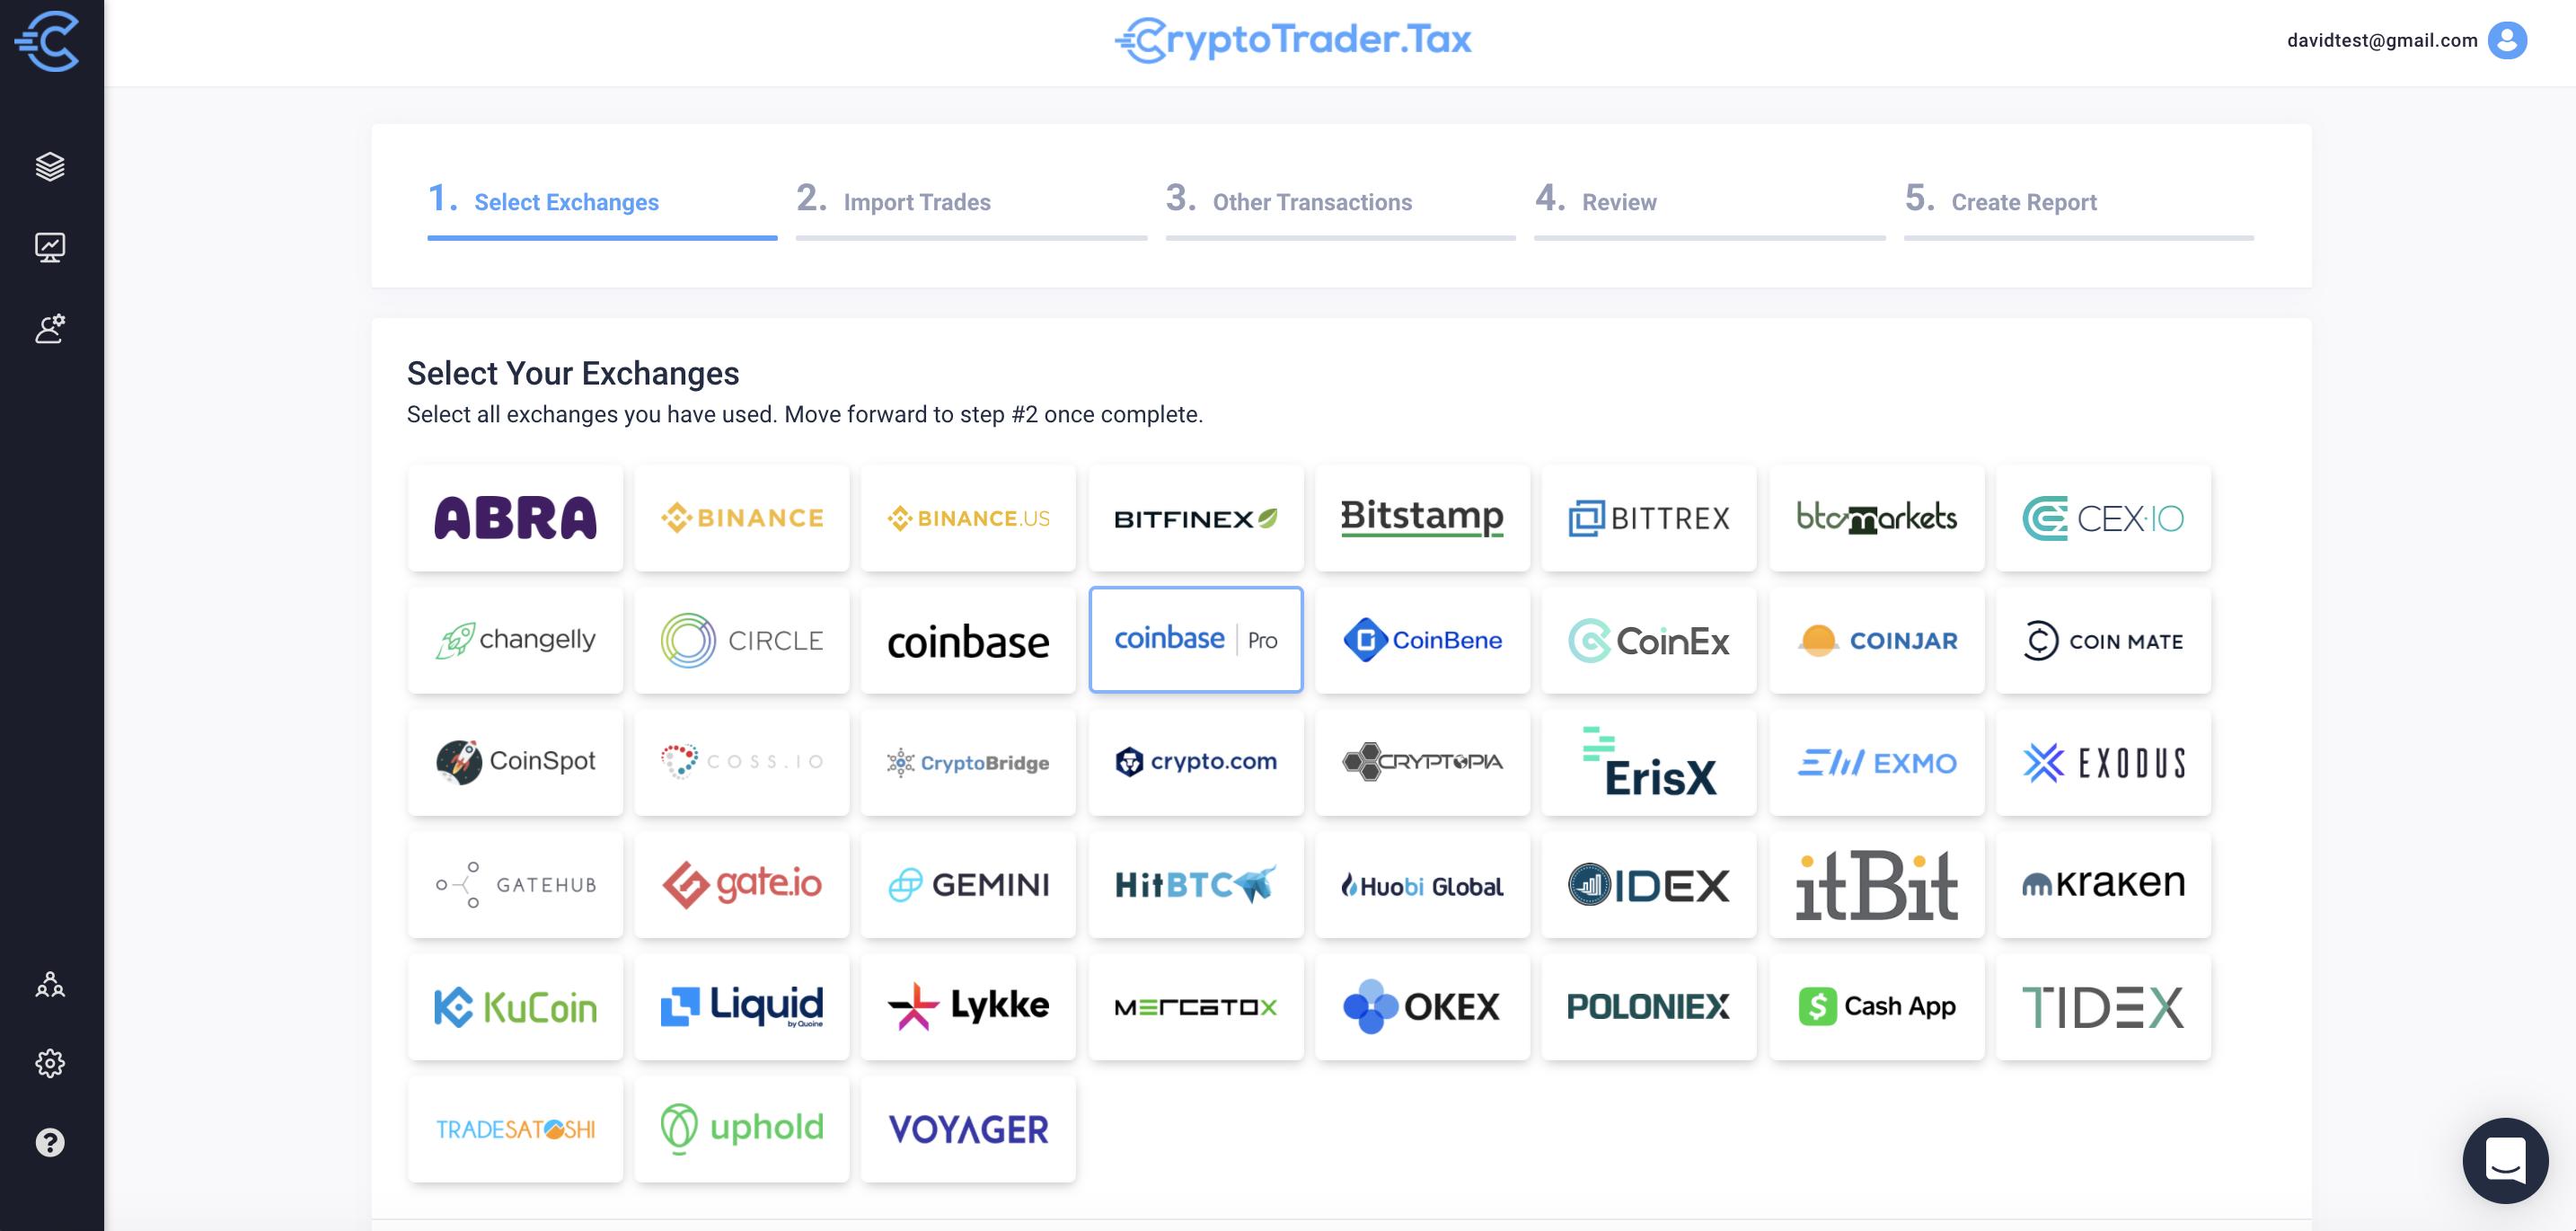 Coinbase Pro CryptoTrader.Tax Import